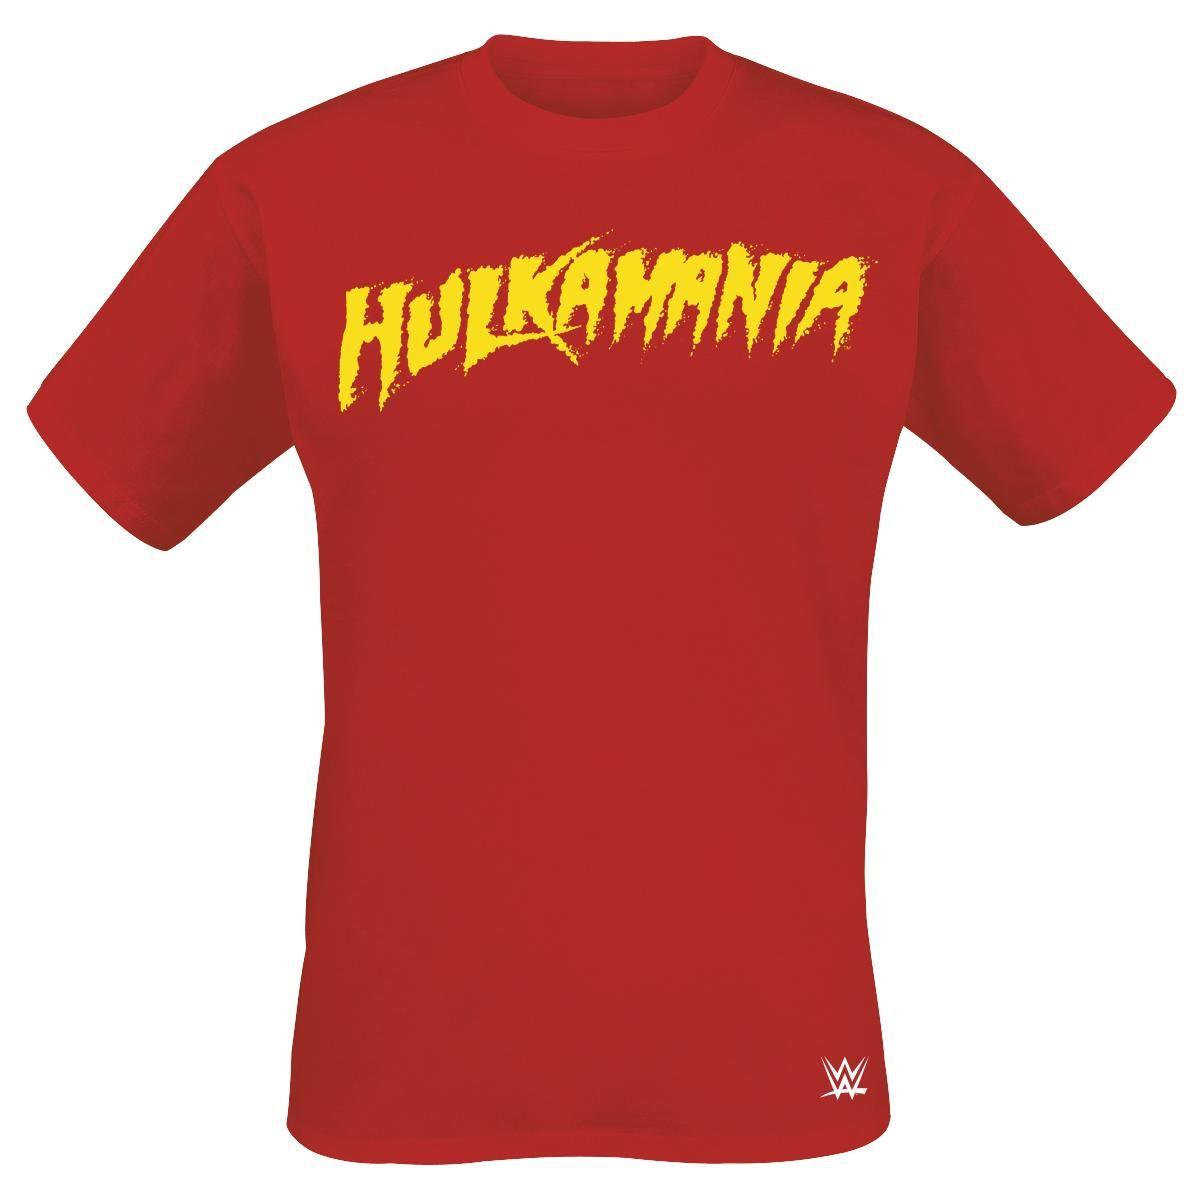 "Classica #T-Shirt uomo rossa ""Hulk Hogan - Hulkamania"" del merchandise ufficiale firmato #WWE con stampa frontale."